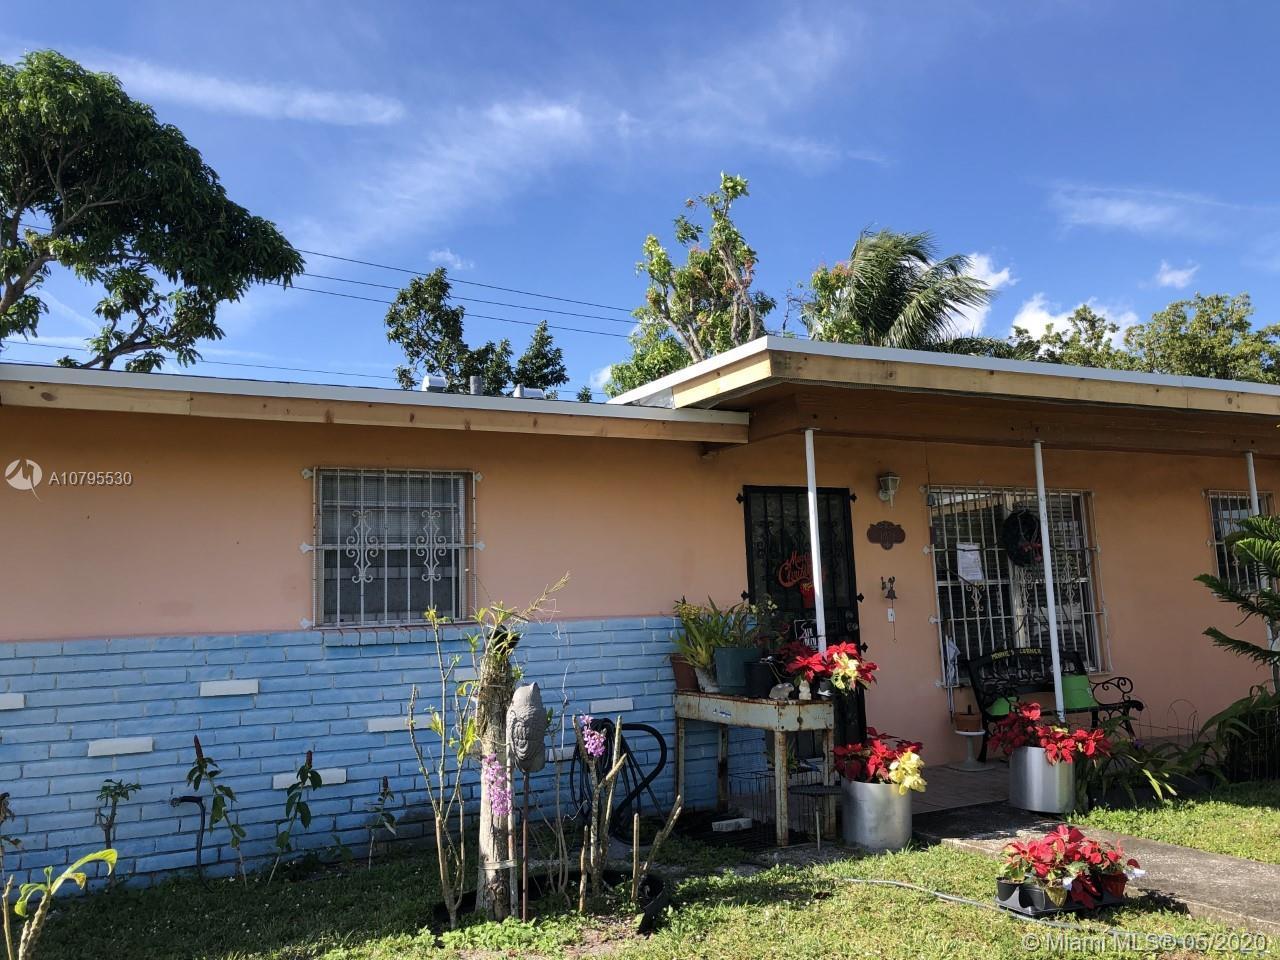 18110 NW 42nd Ave, Miami Gardens, FL 33055 - Miami Gardens, FL real estate listing